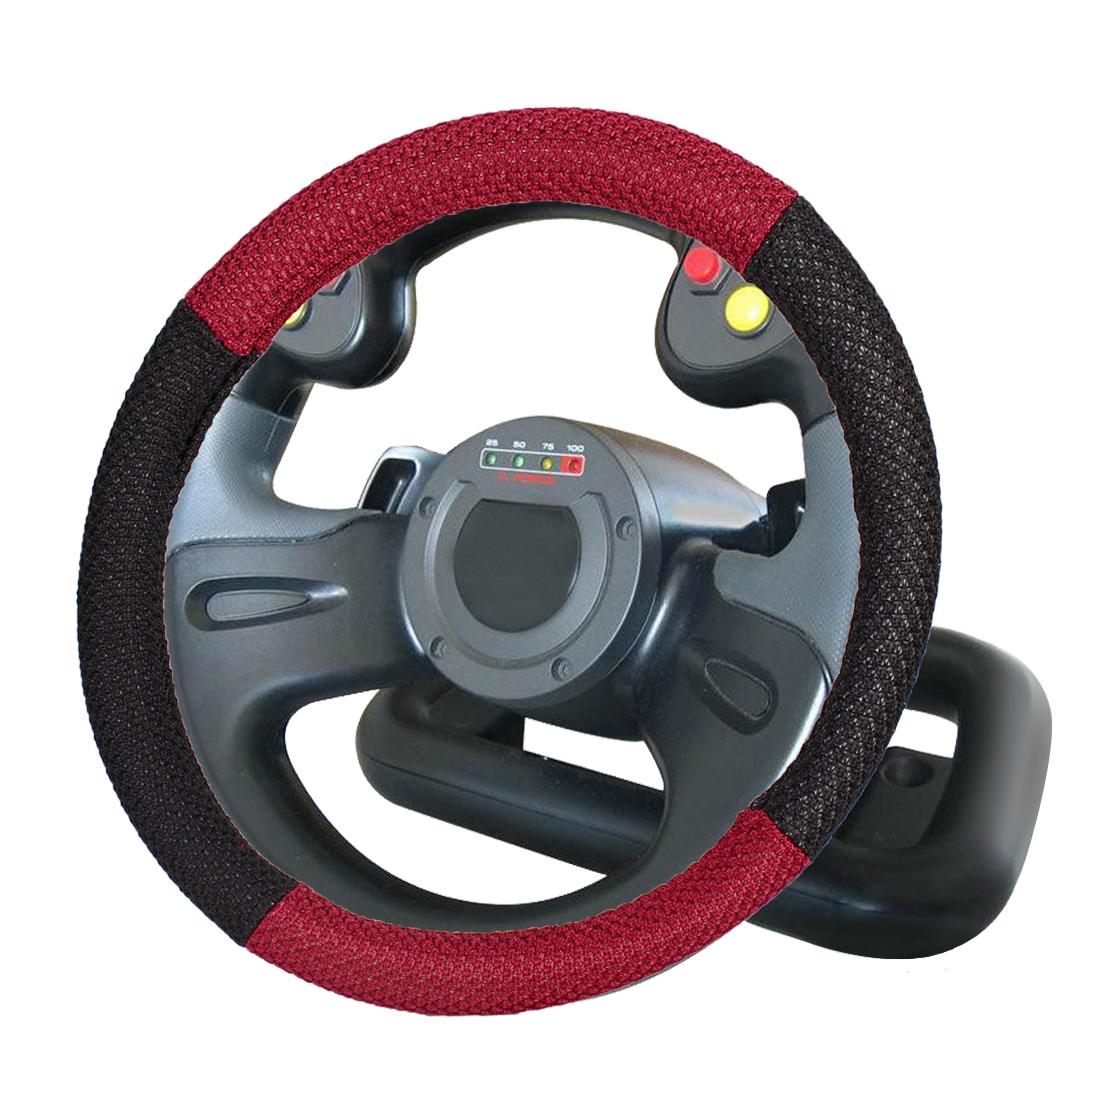 38cm Dia Black Red Nylon Braided Nonslip Steering Wheel Cover Guard for Car